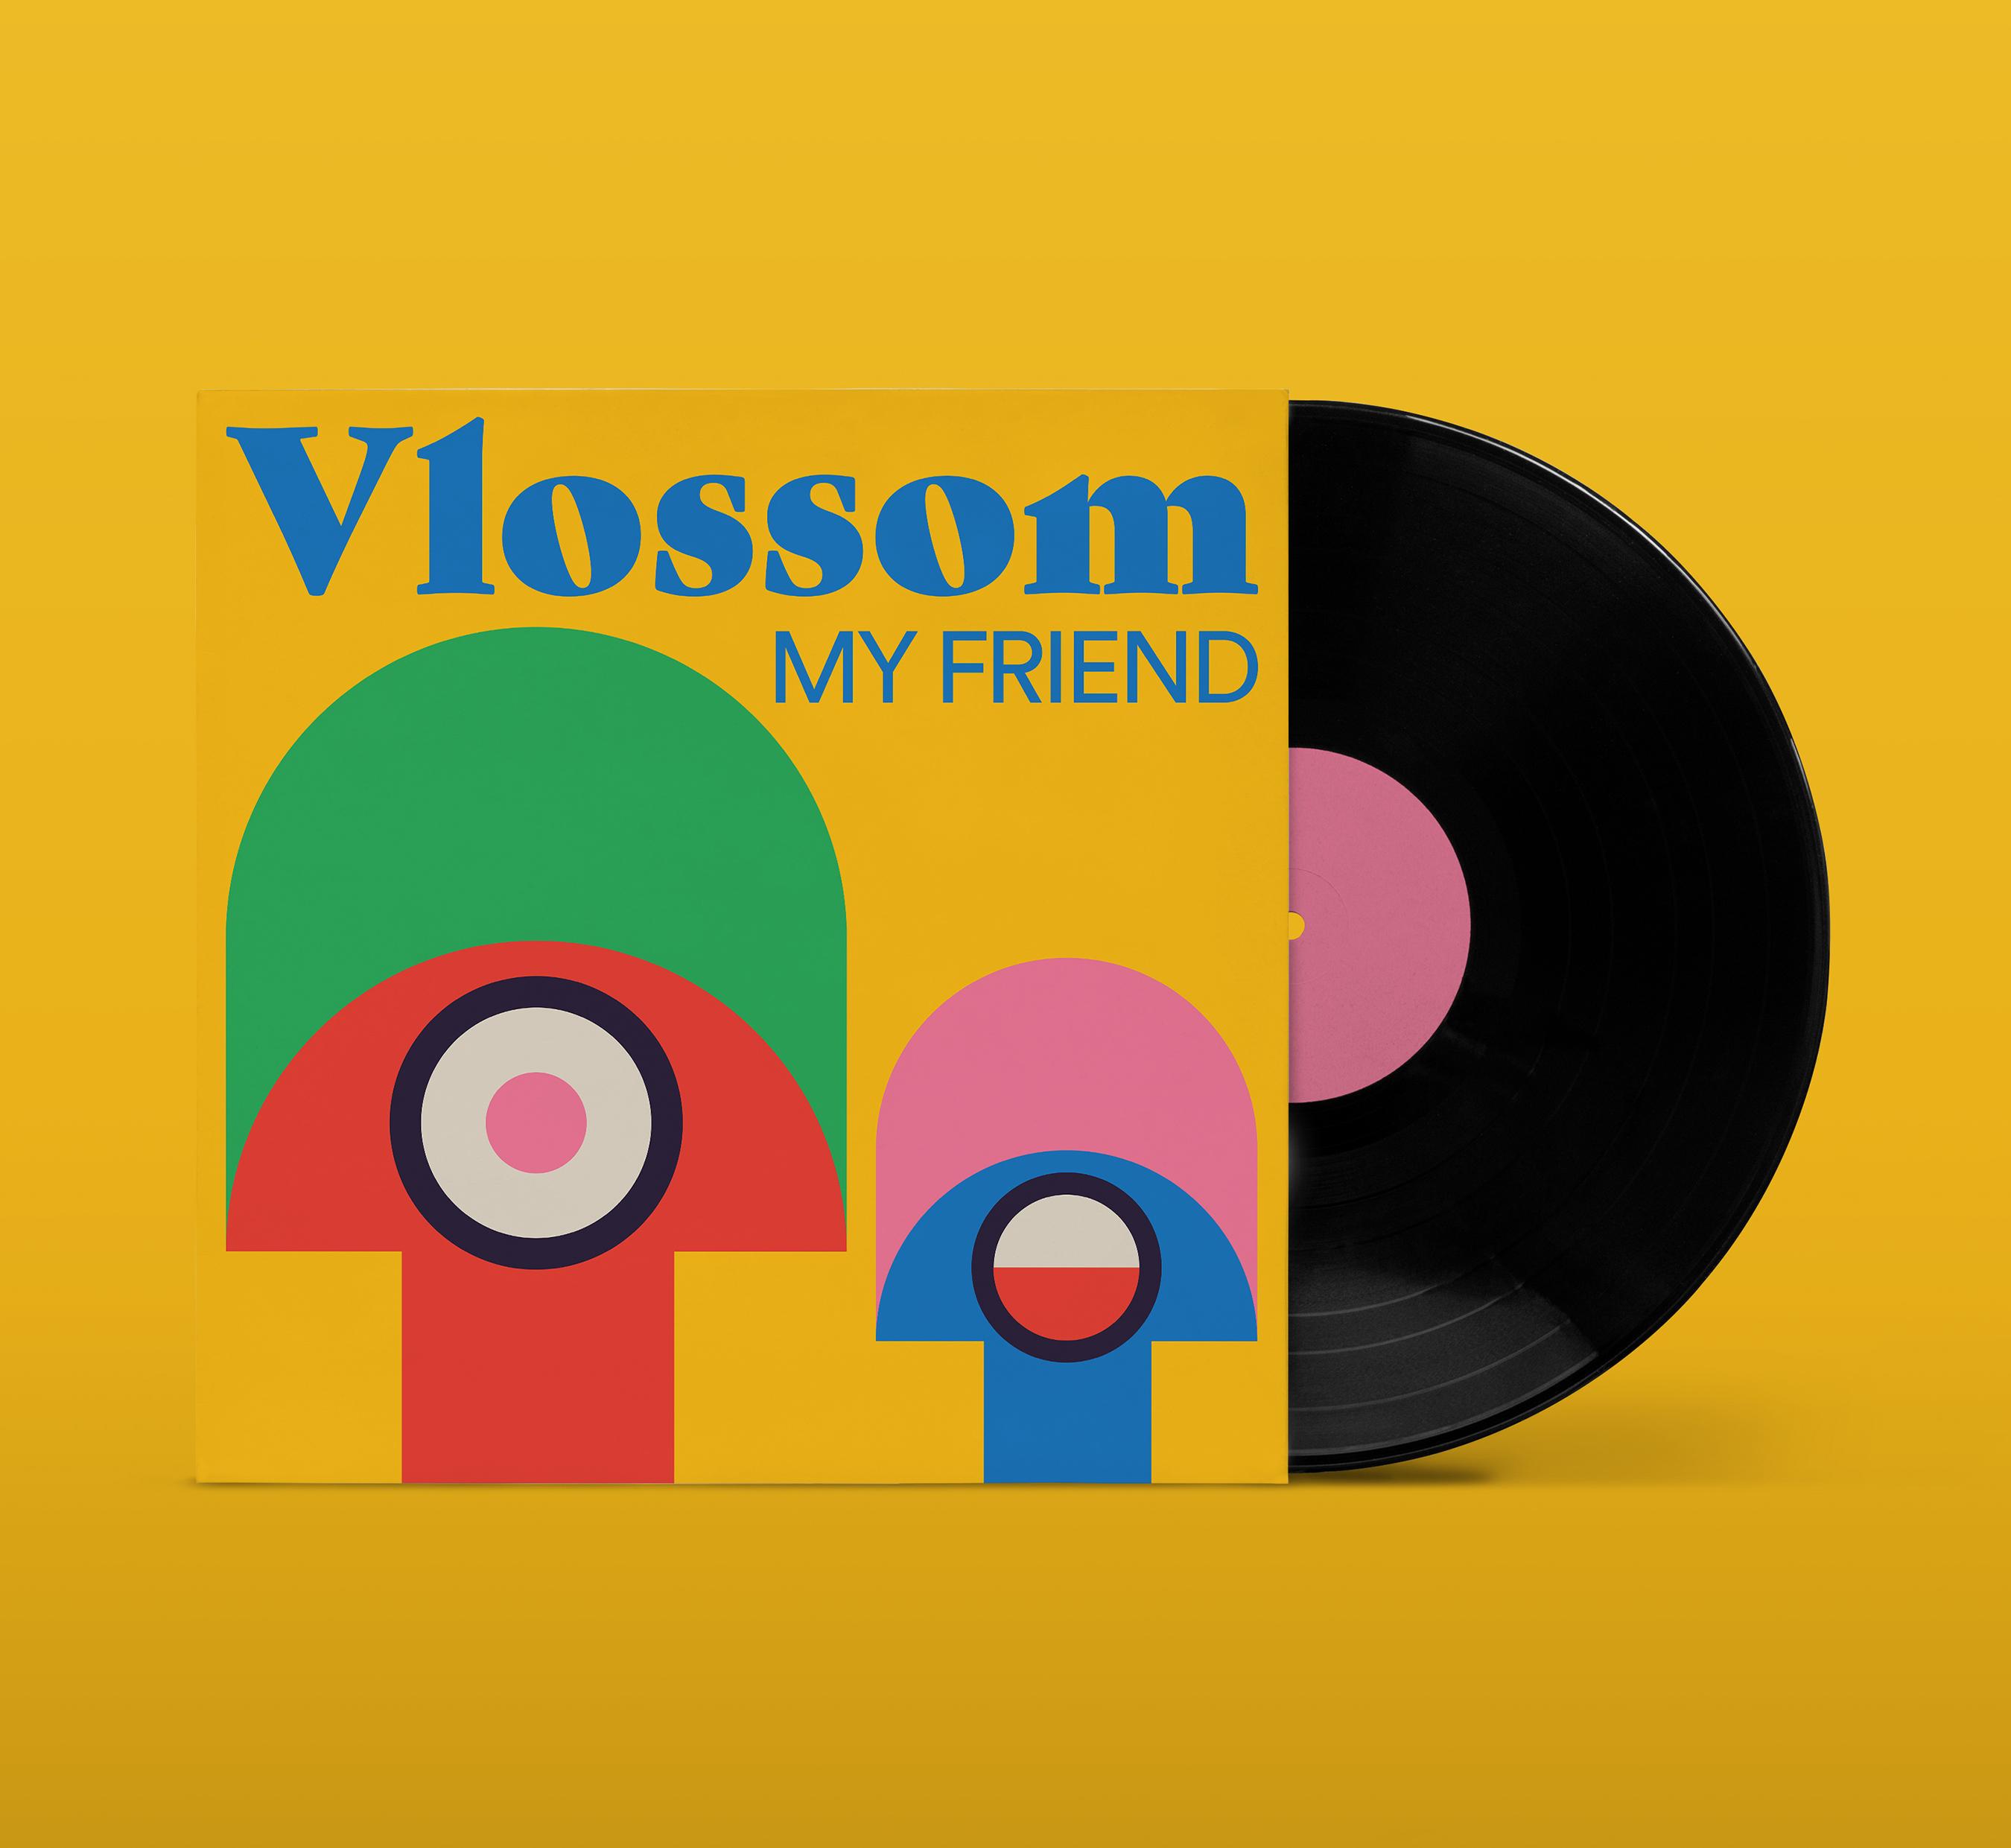 album_vlossom_my_friend_color_2_laura_niubo